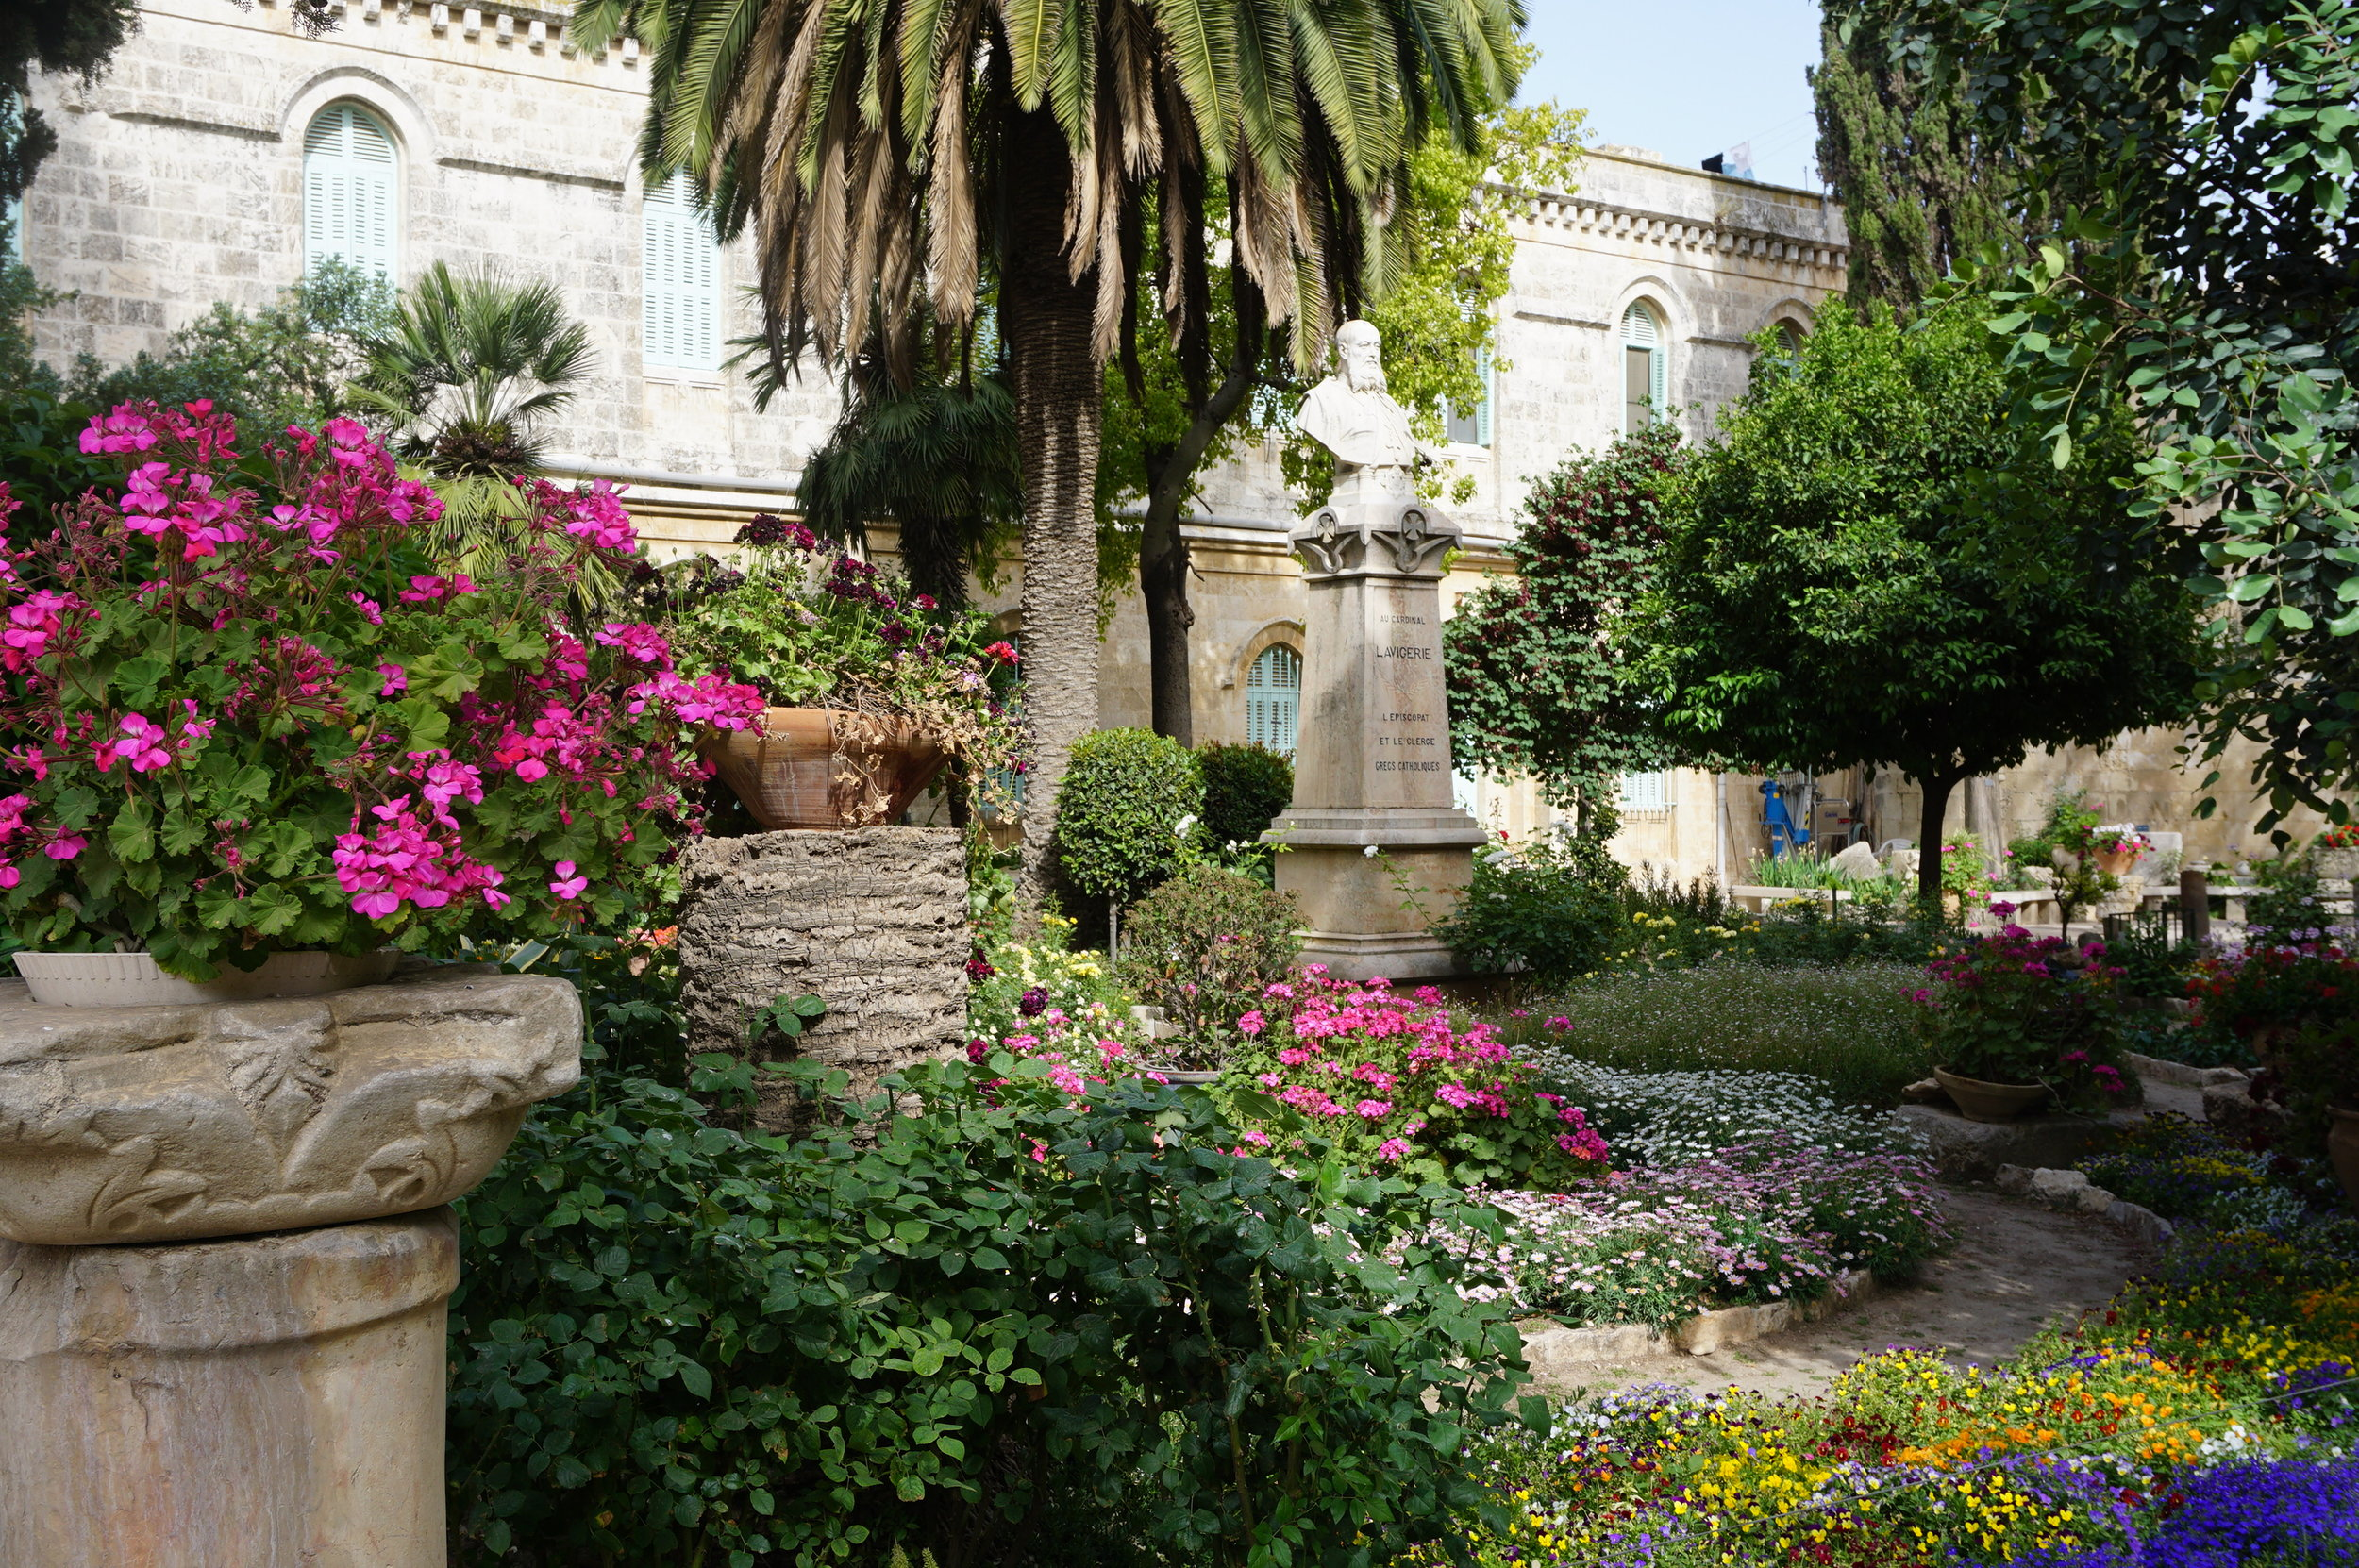 Gardens at Pool of Bethesda (1).JPG